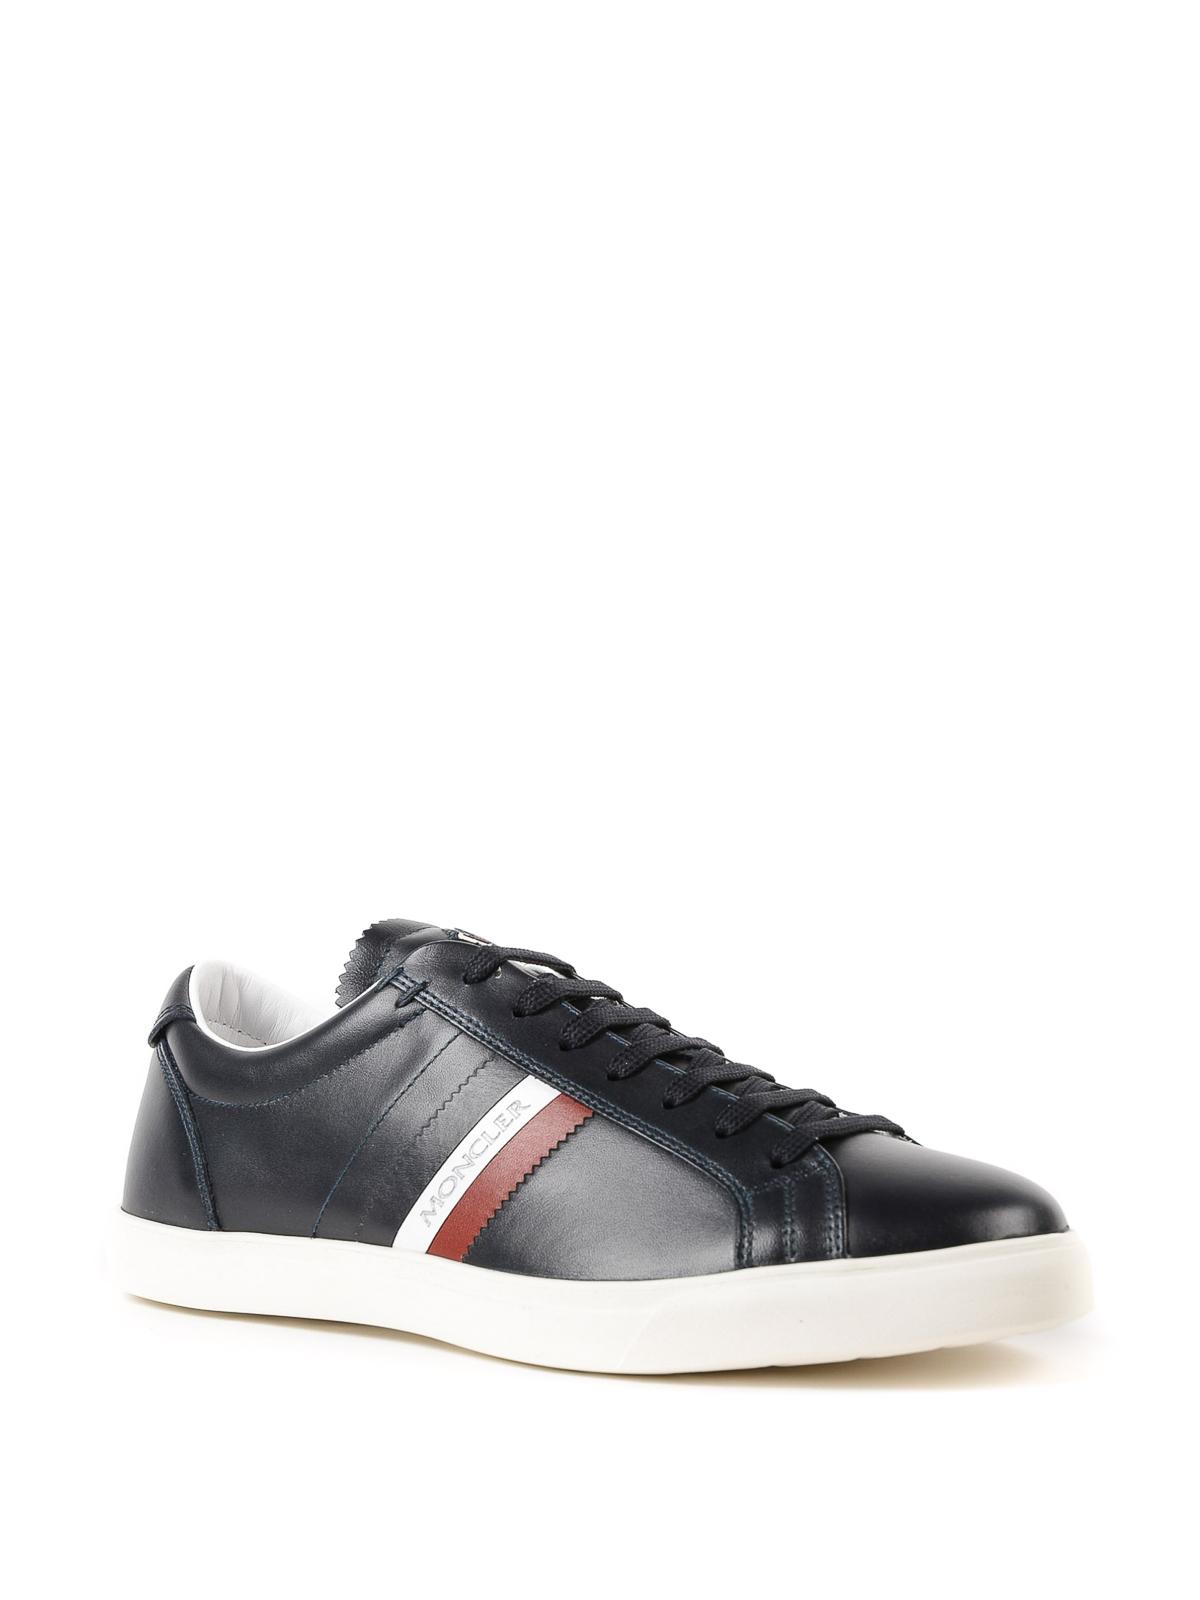 Moncler - La Monaco navy blue sneakers